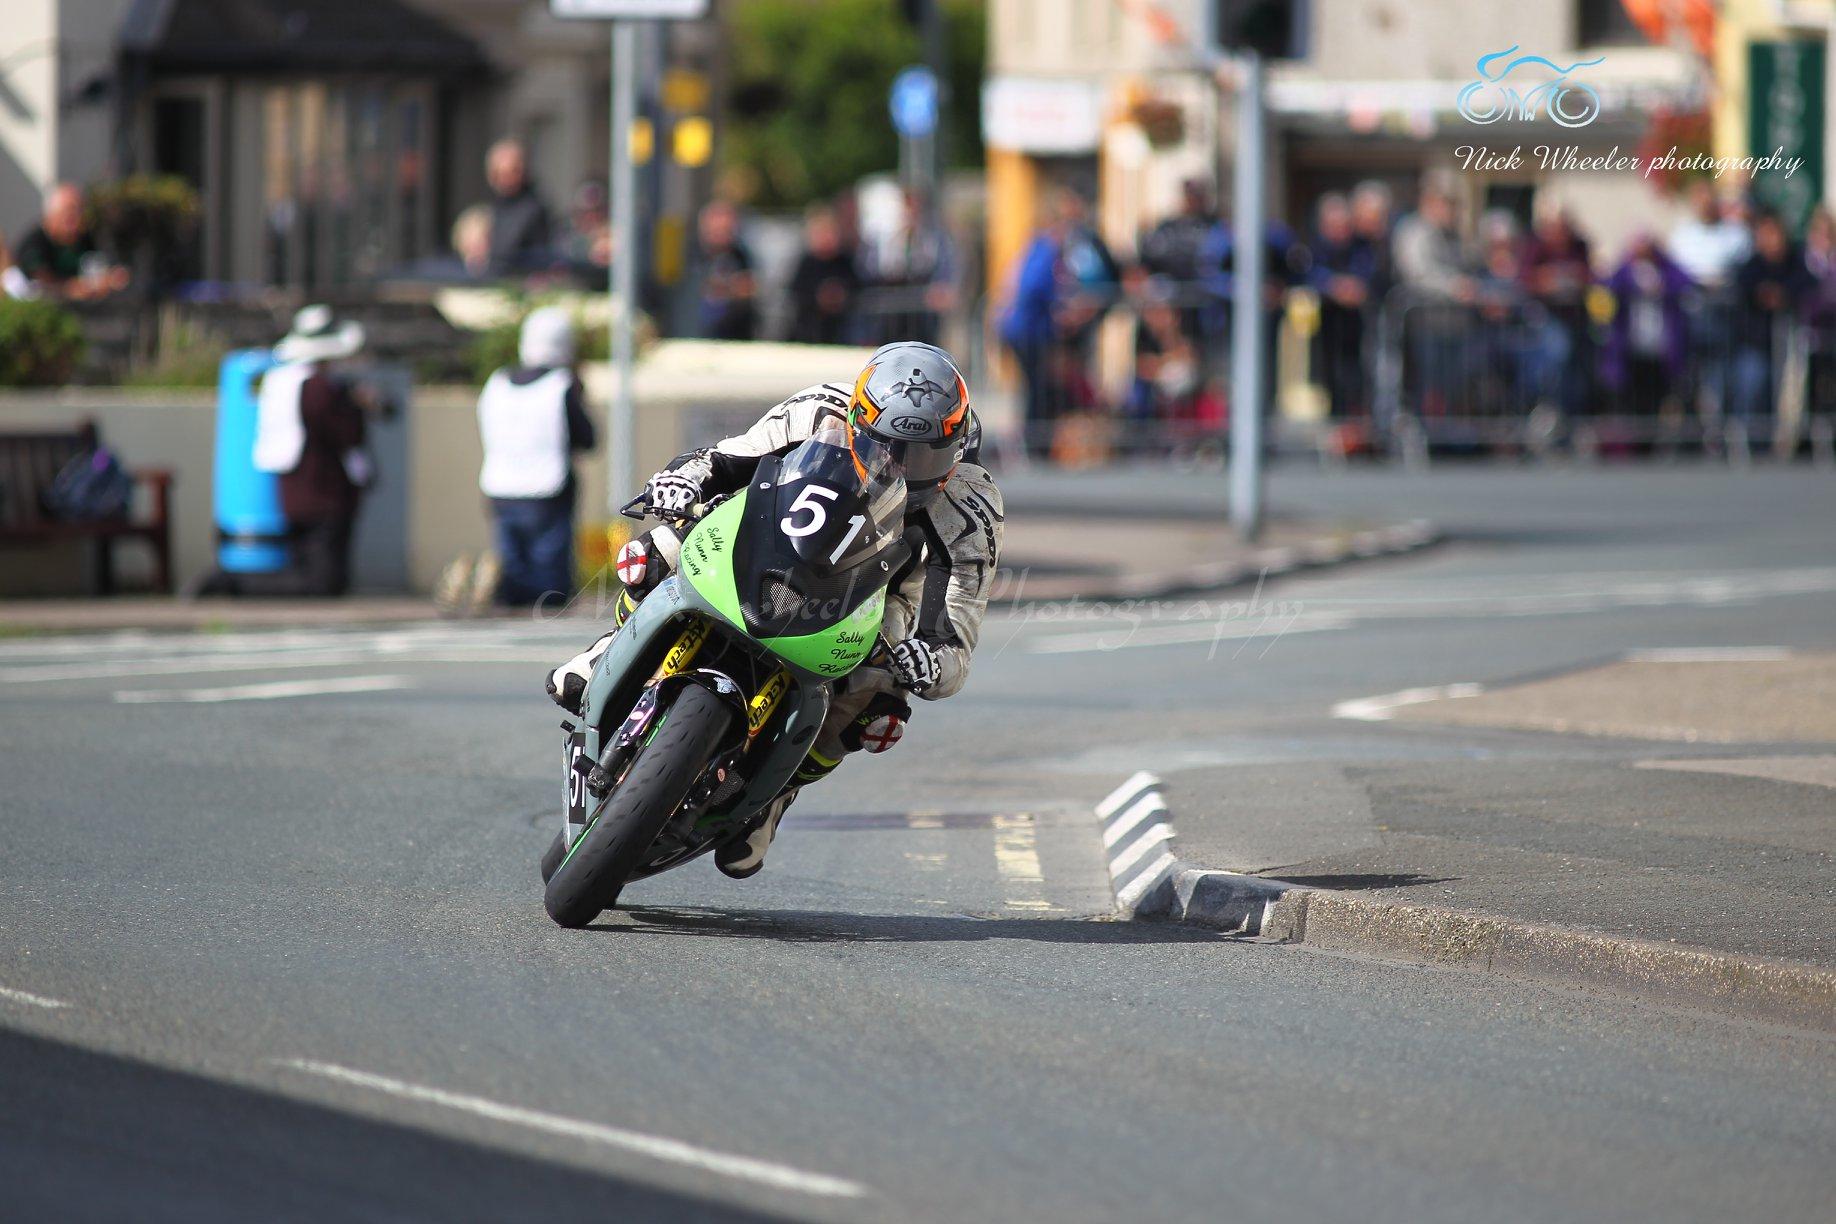 Barsby Hoping To Make Manx GP Return